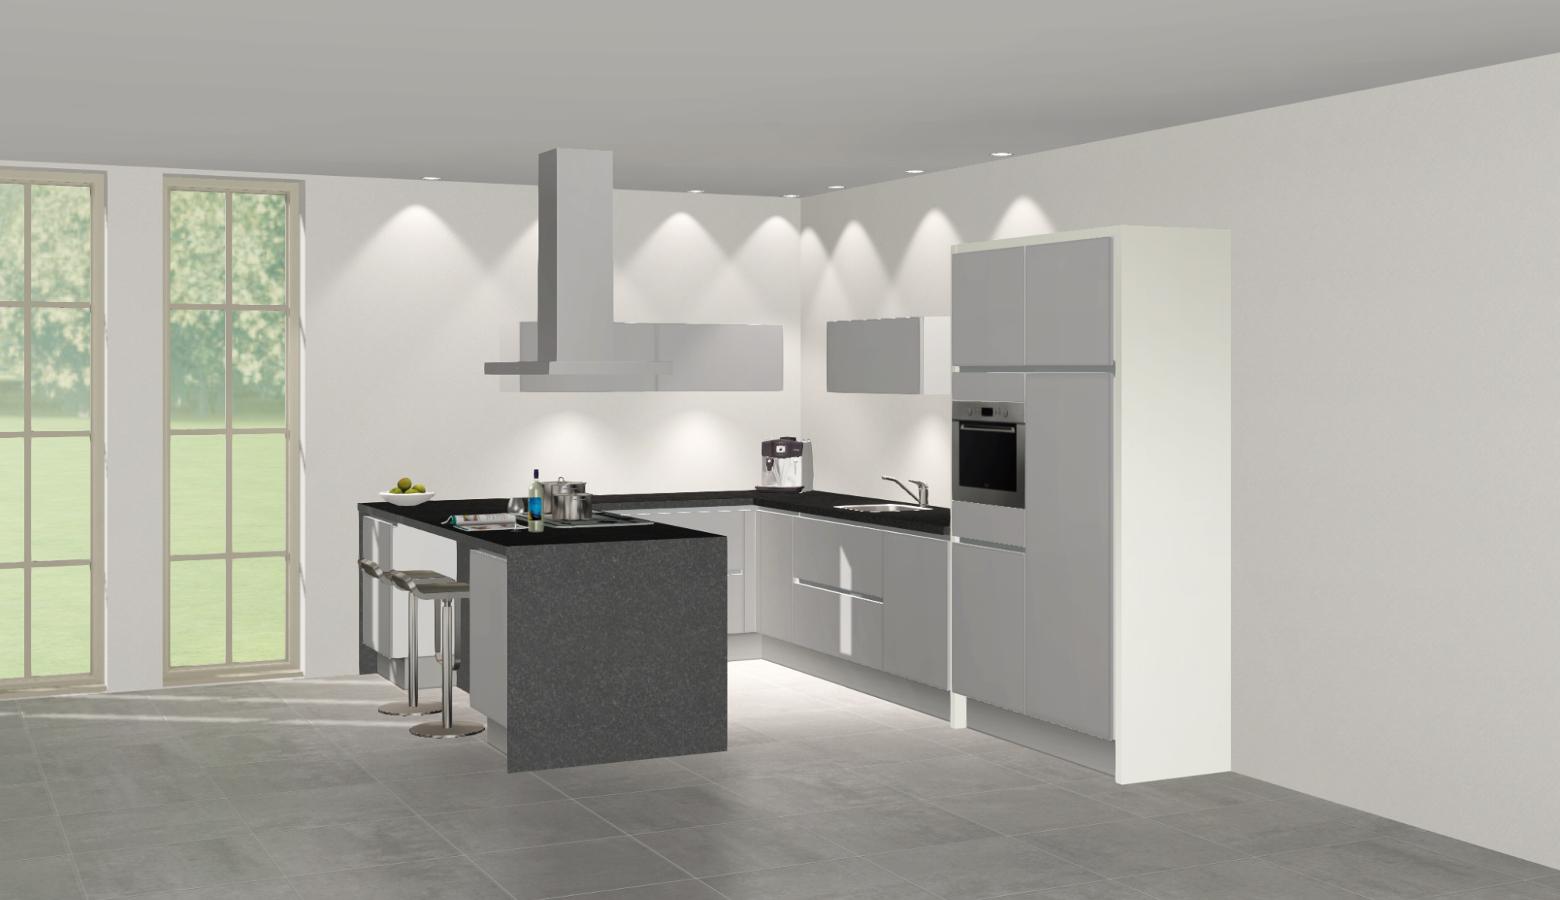 Keuken beira steinhaus keuken kampioen - Model keuken ...